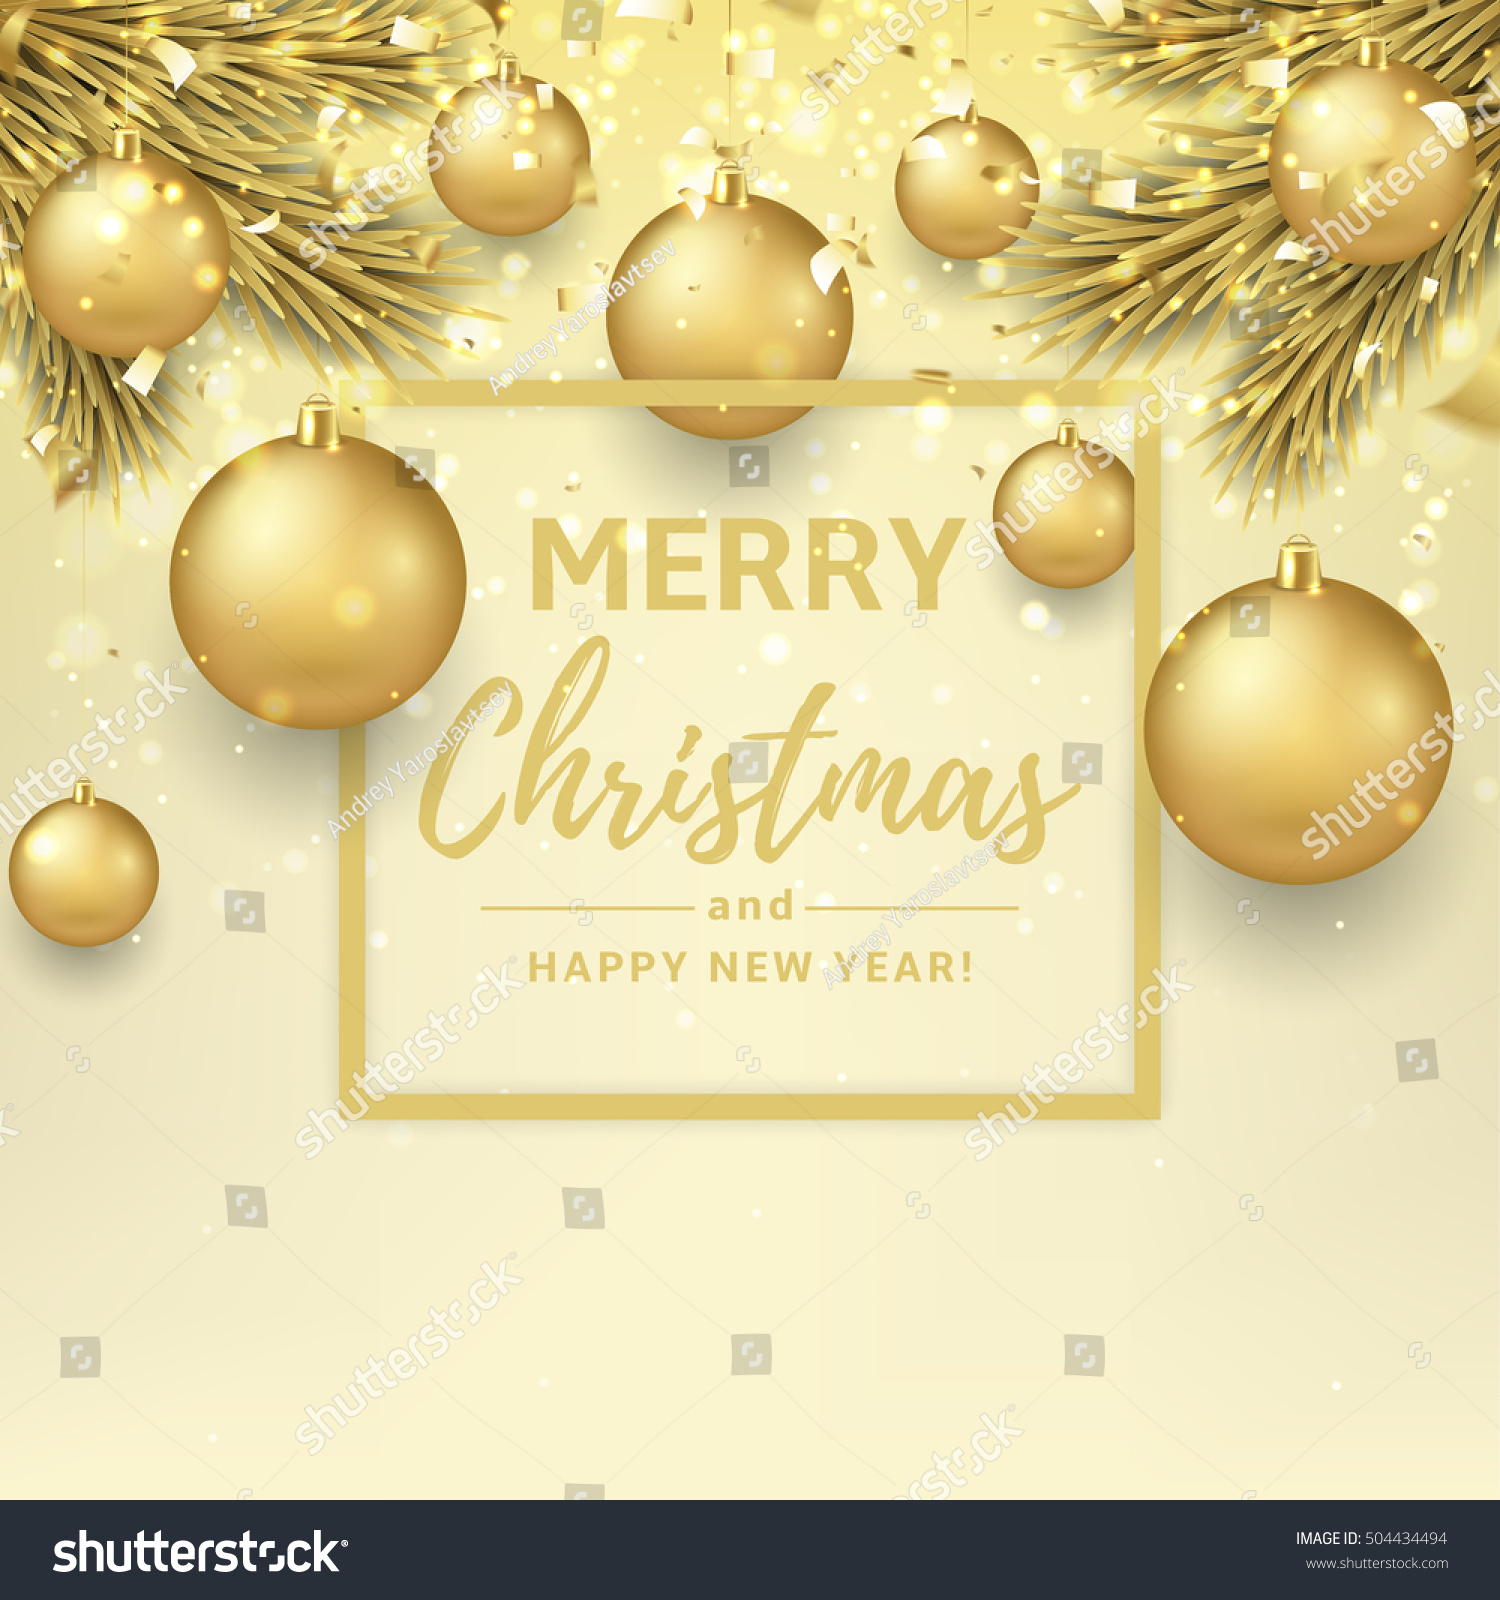 merry christmas happy new year illustration stock vector